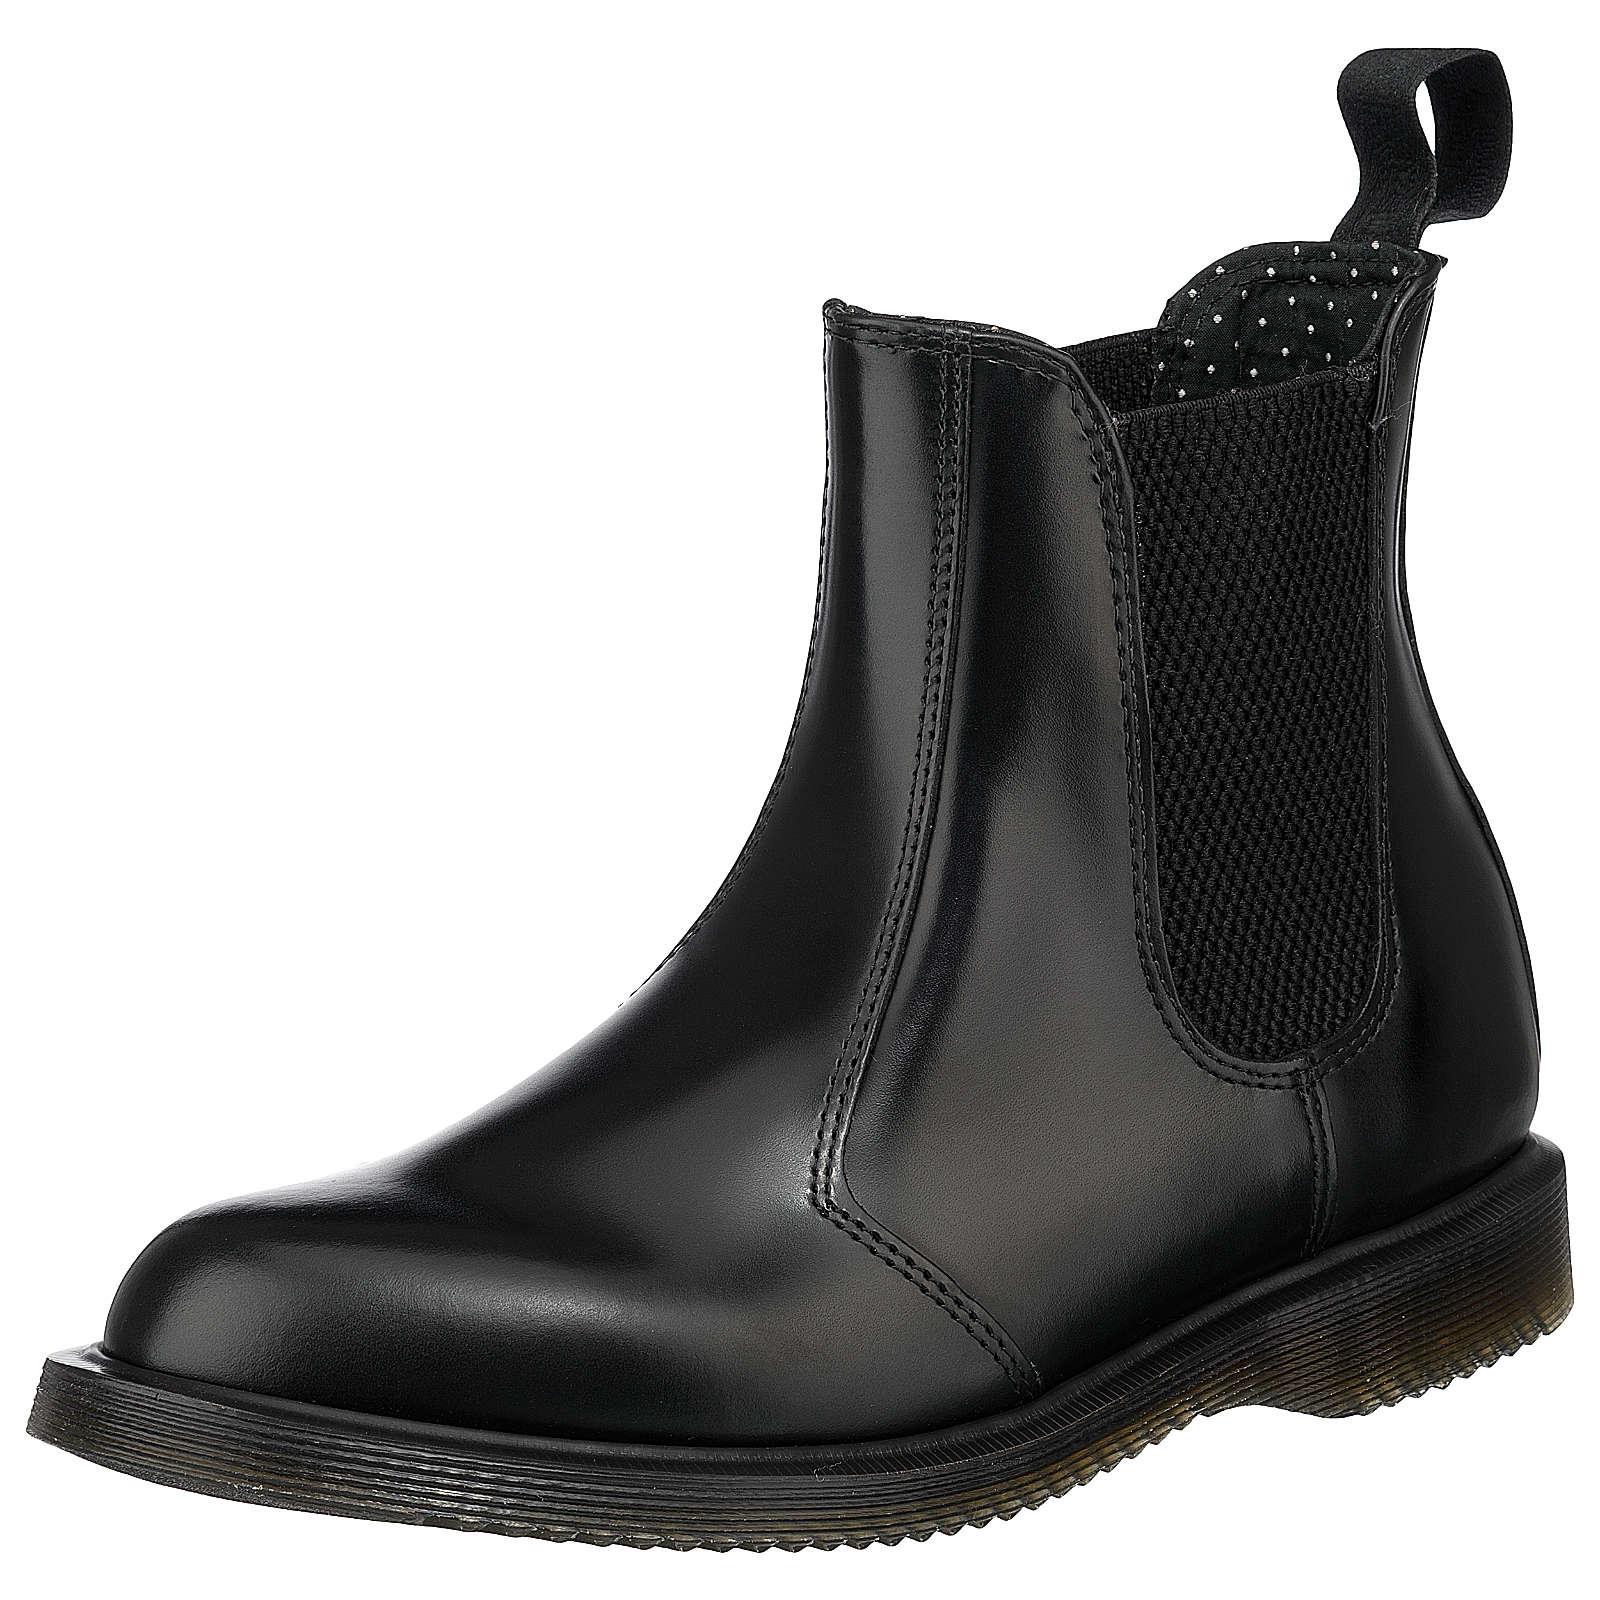 Dr. Martens Flora Chelsea Boots schwarz Damen Gr. 40